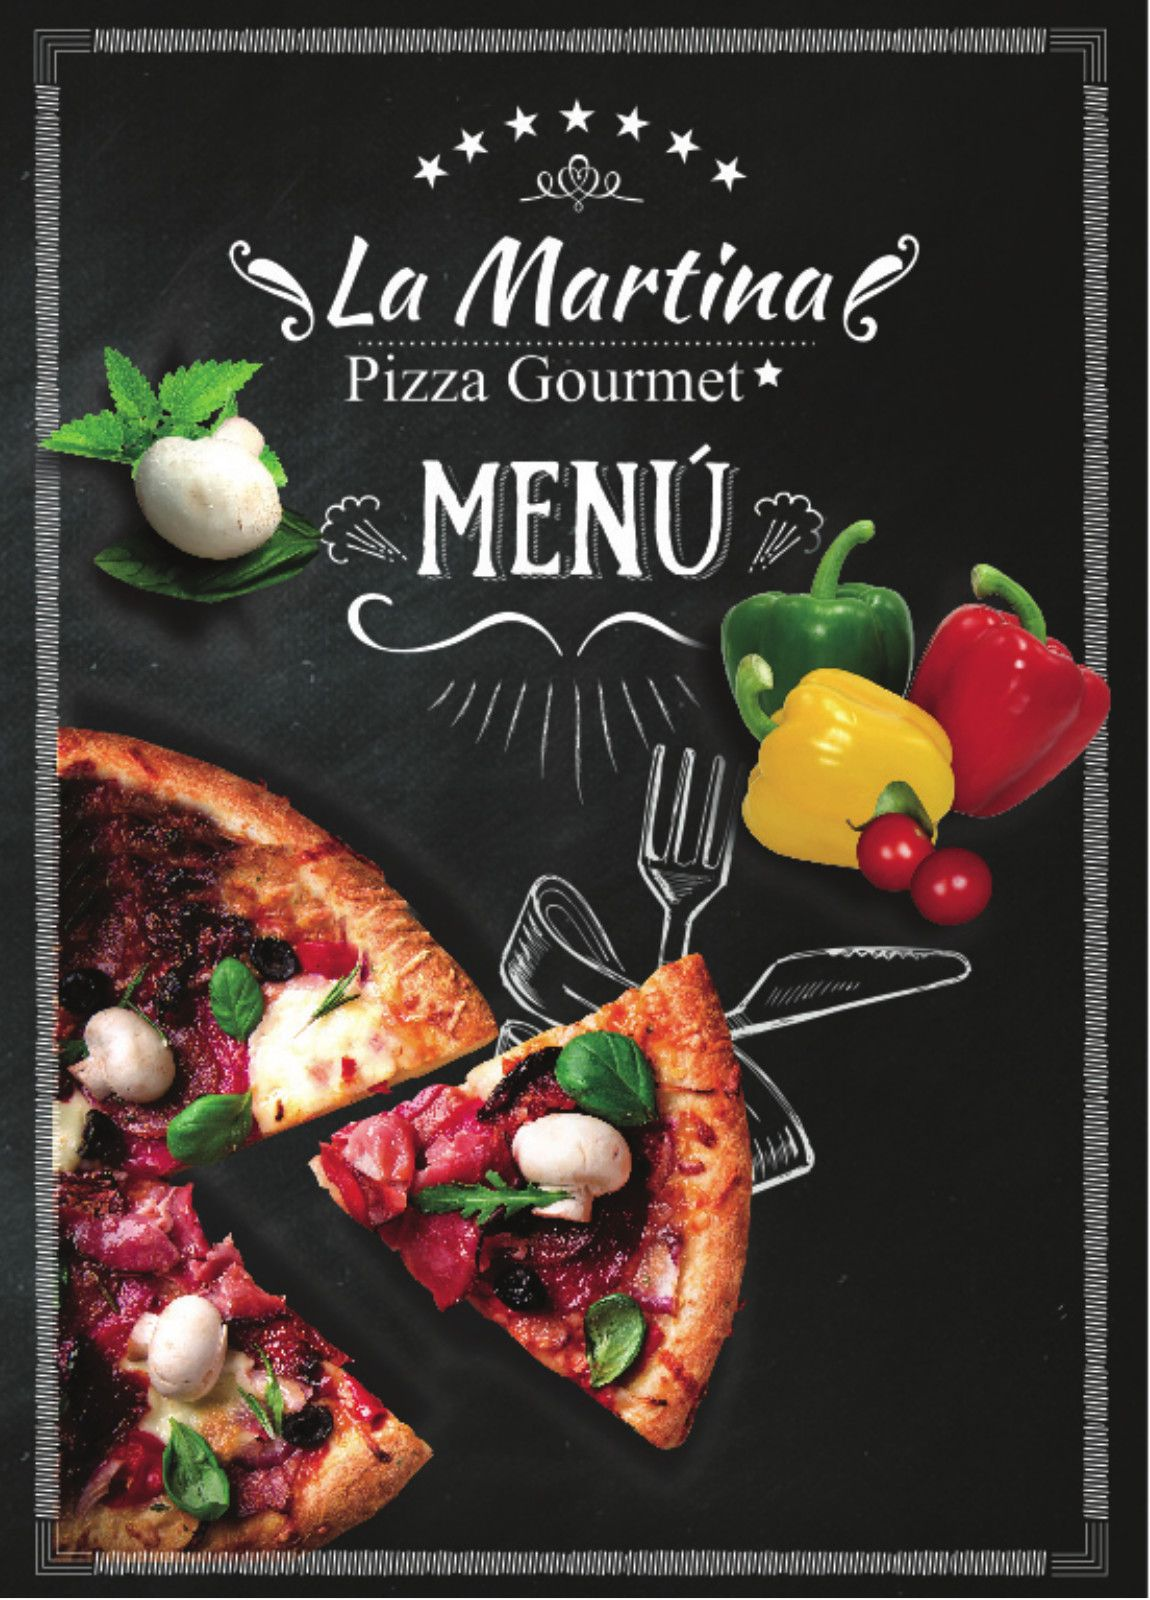 Restaurante La Martina Pizza Gourmet en Zona Rosa de cocina ...